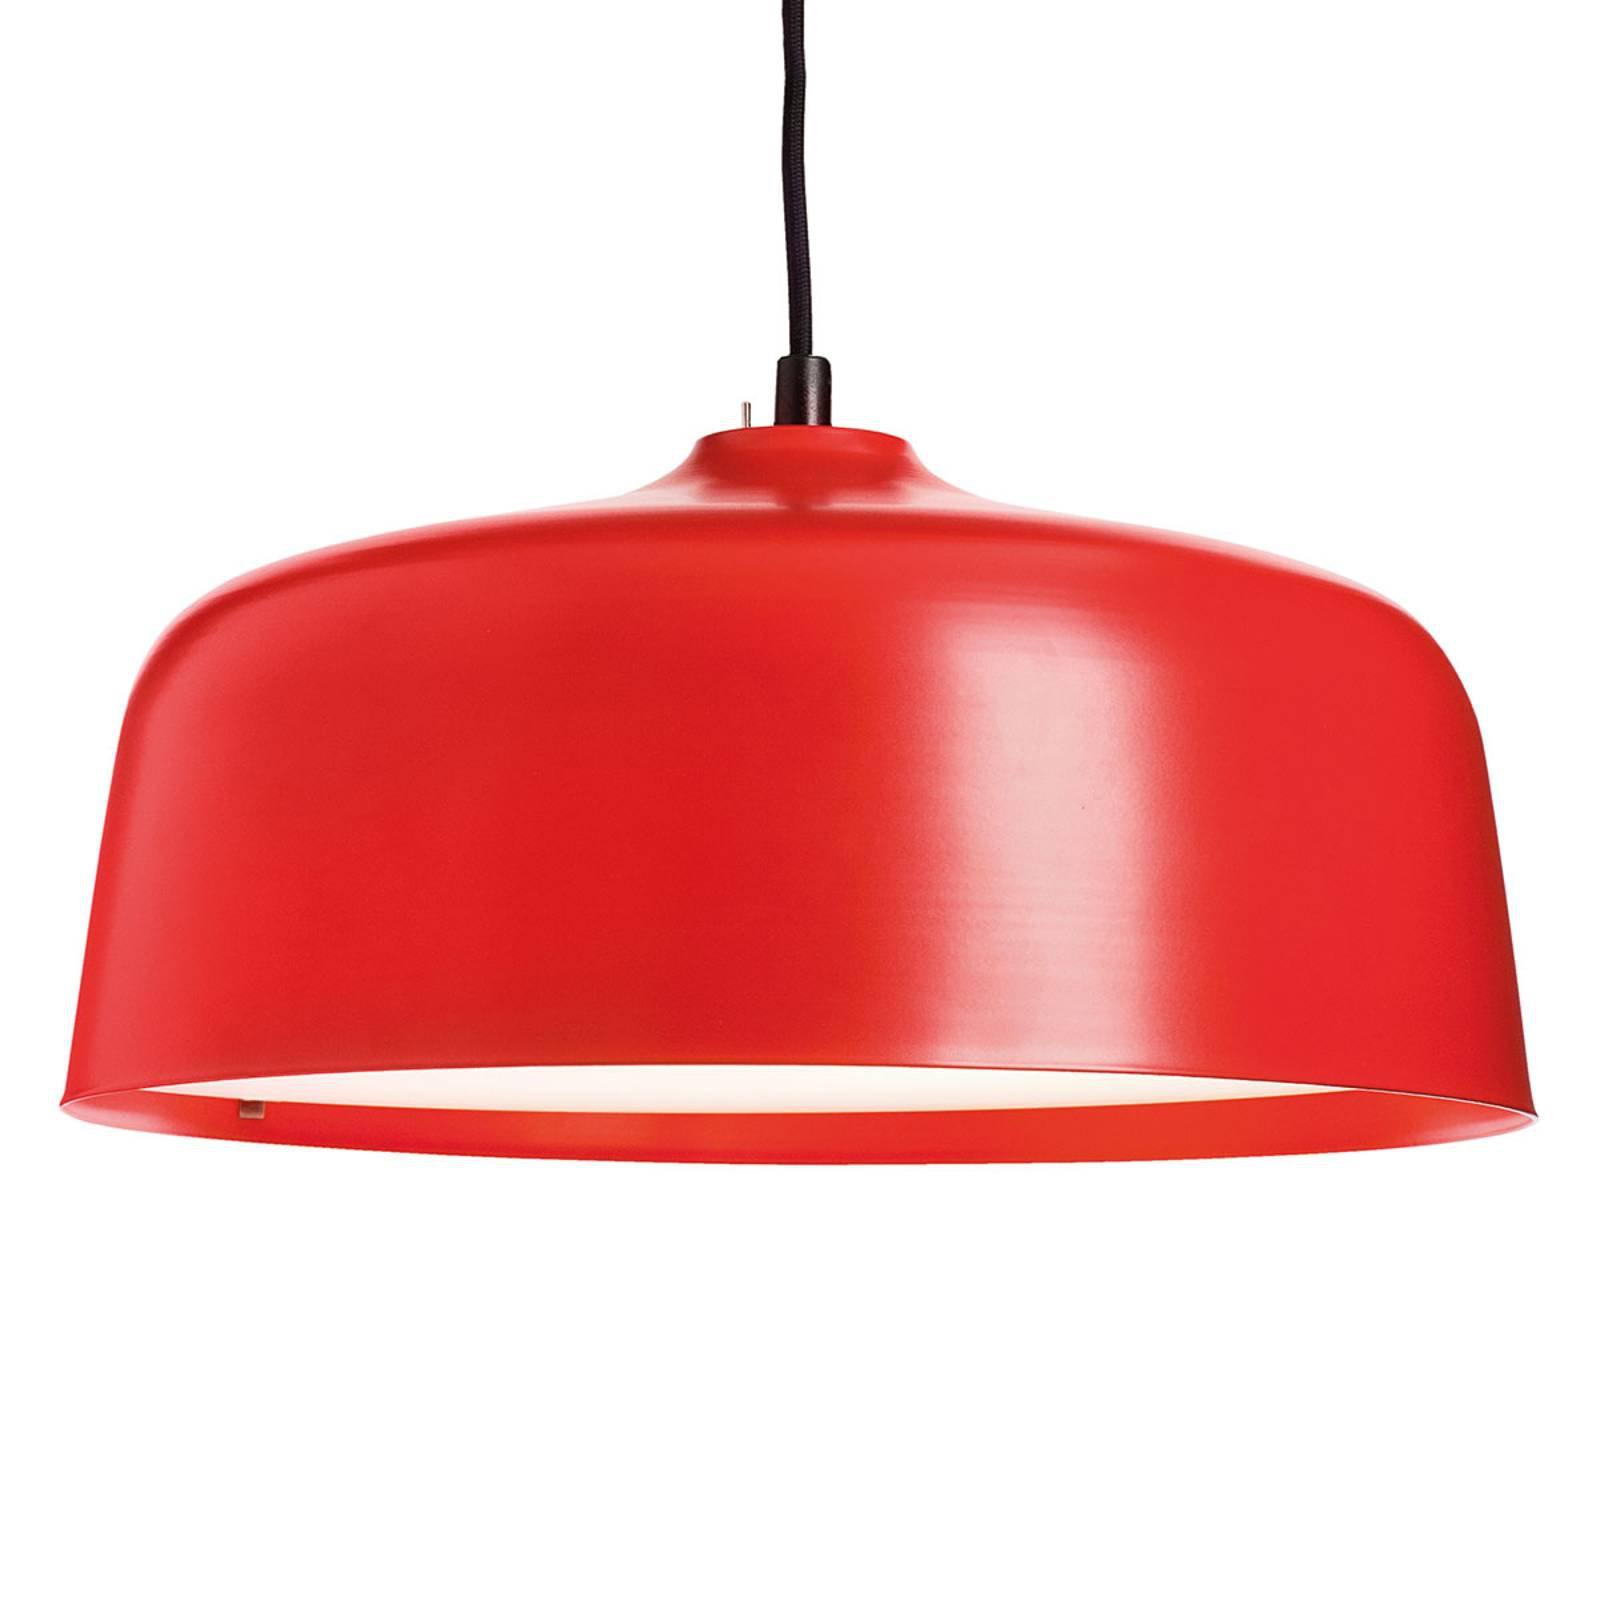 Innolux Candeo lysterapi-hengelampe, rød